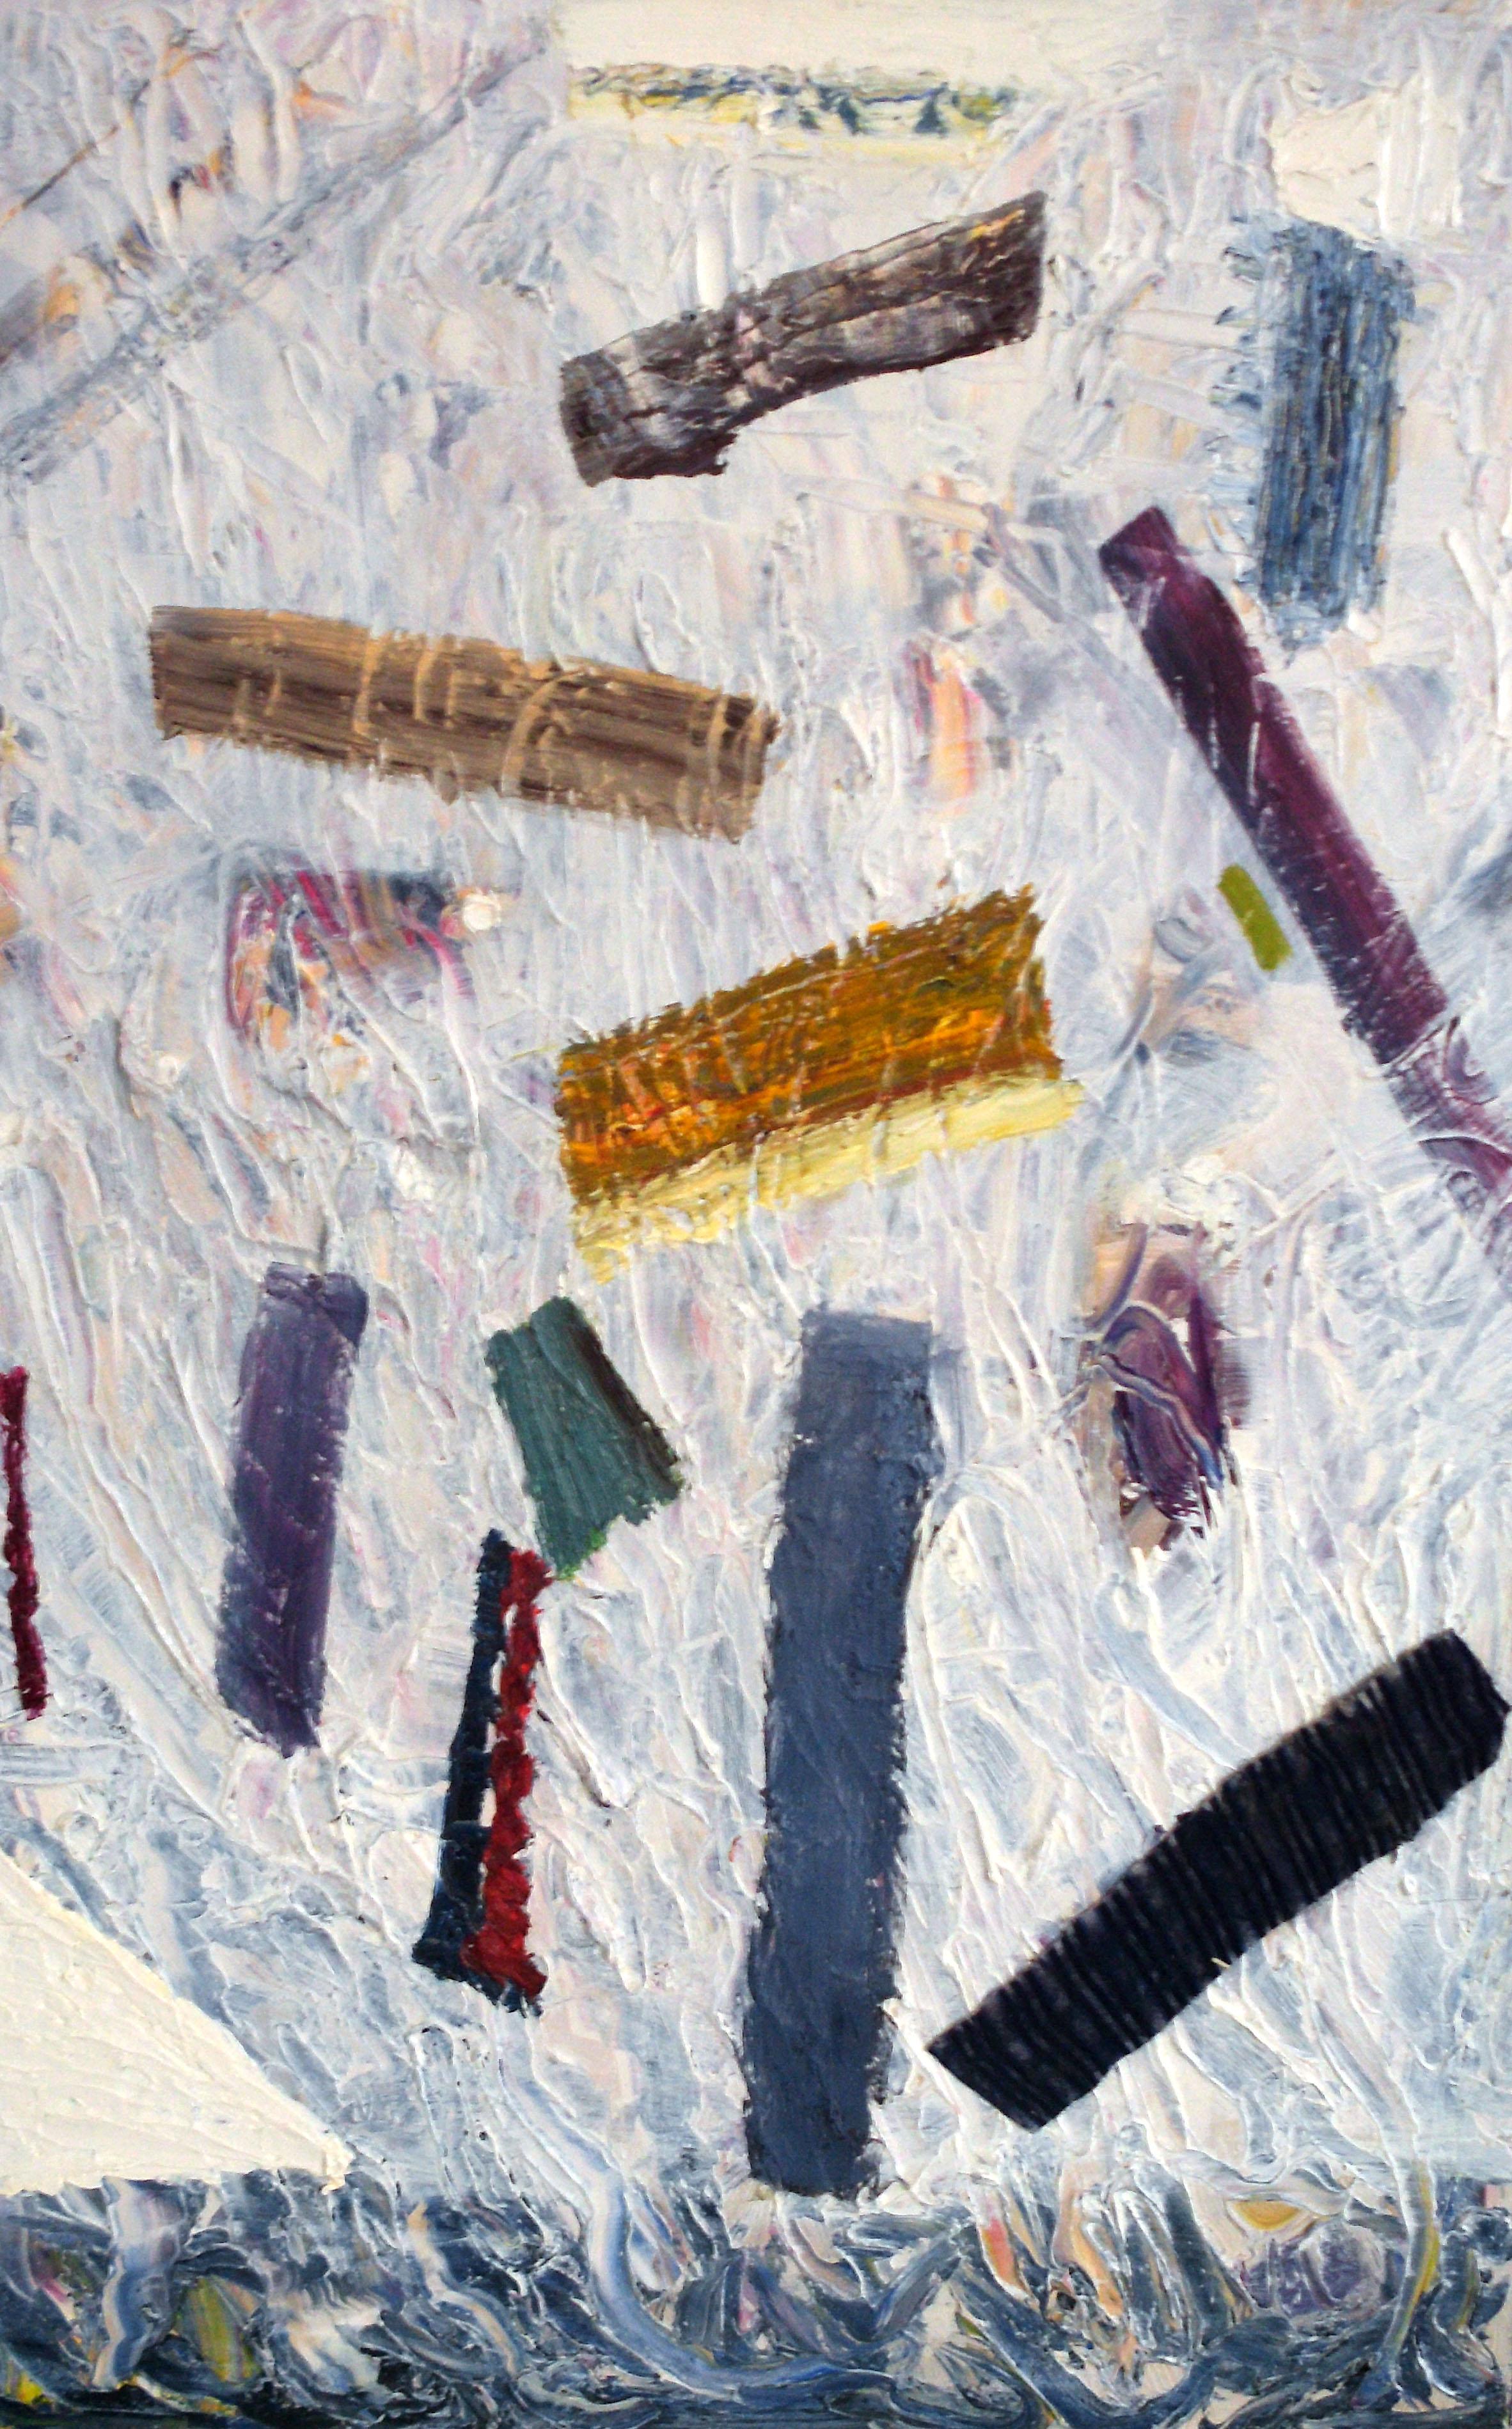 Strawalde - Tafelbild | Öl auf Leinwand | 2010